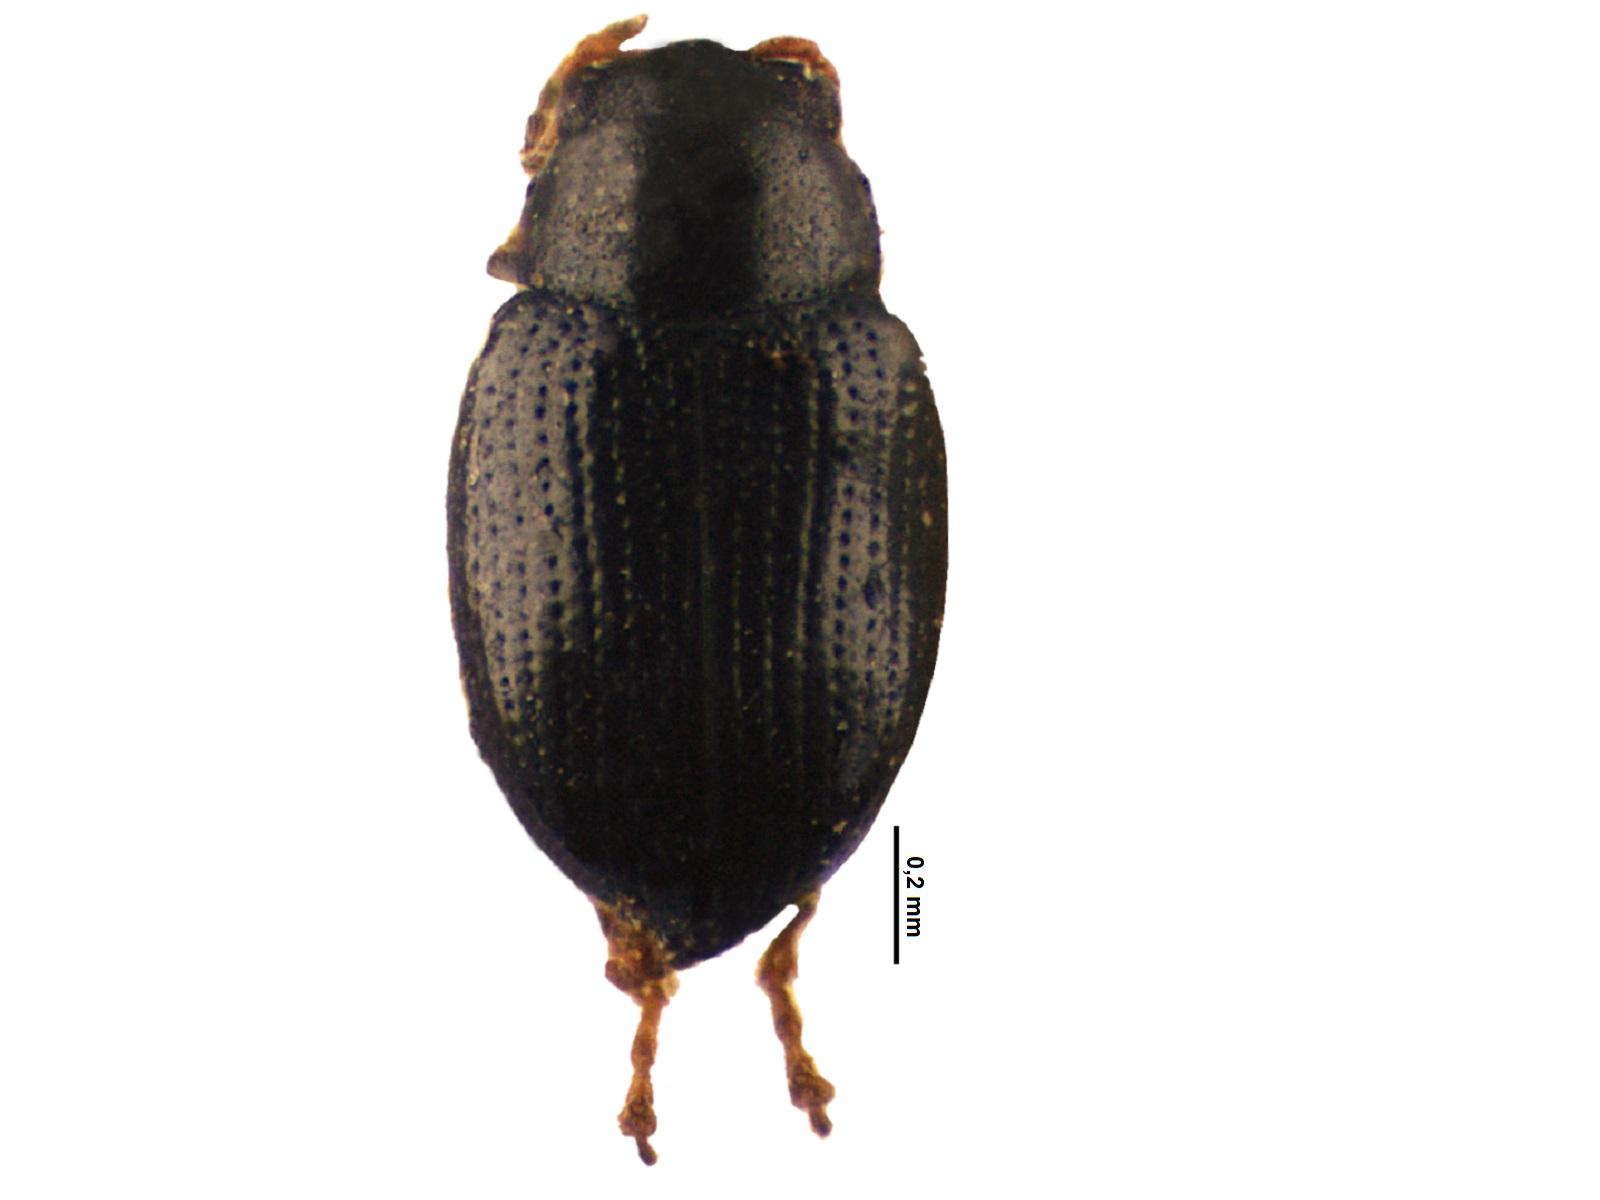 Chaetocnema palmirensis Bechyné, 1966